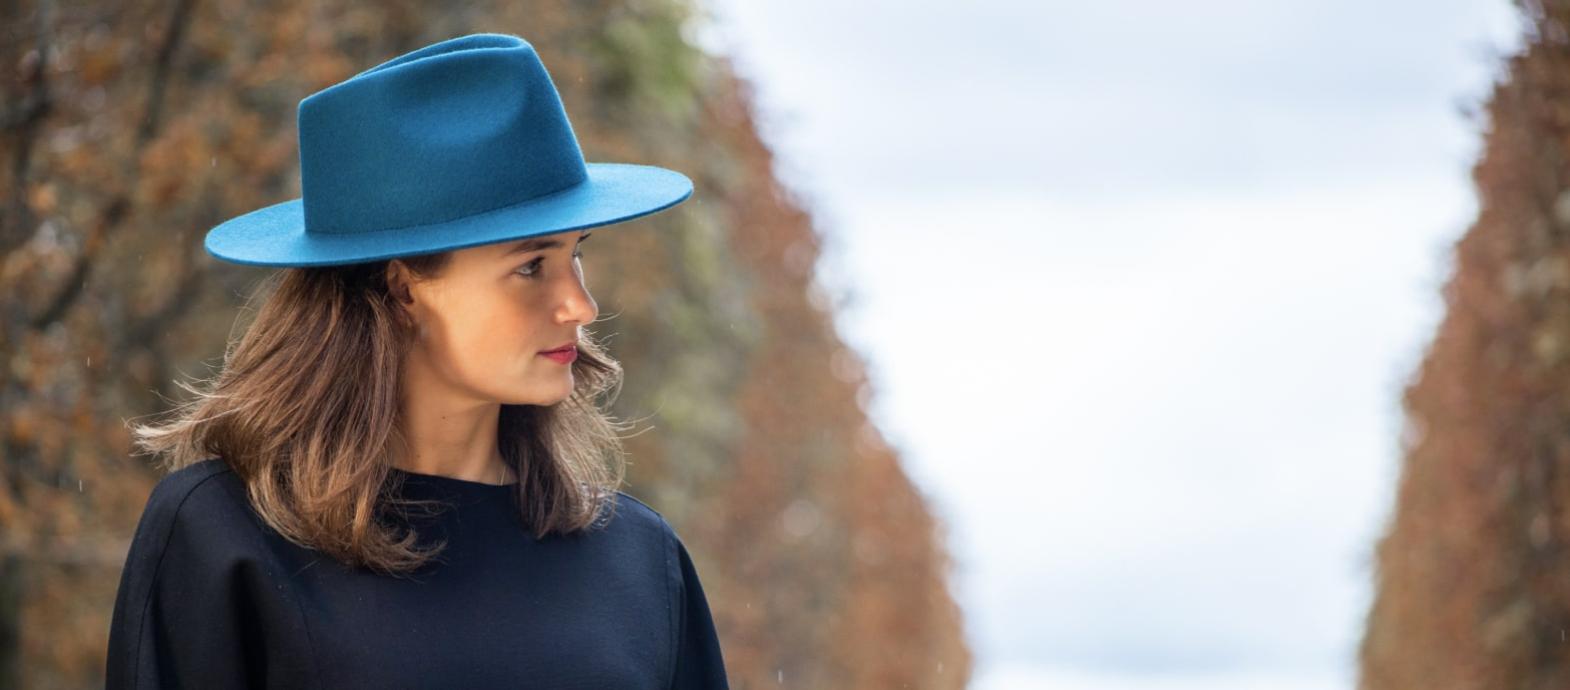 Bronte- Charley- fedora hoed in teal blauw